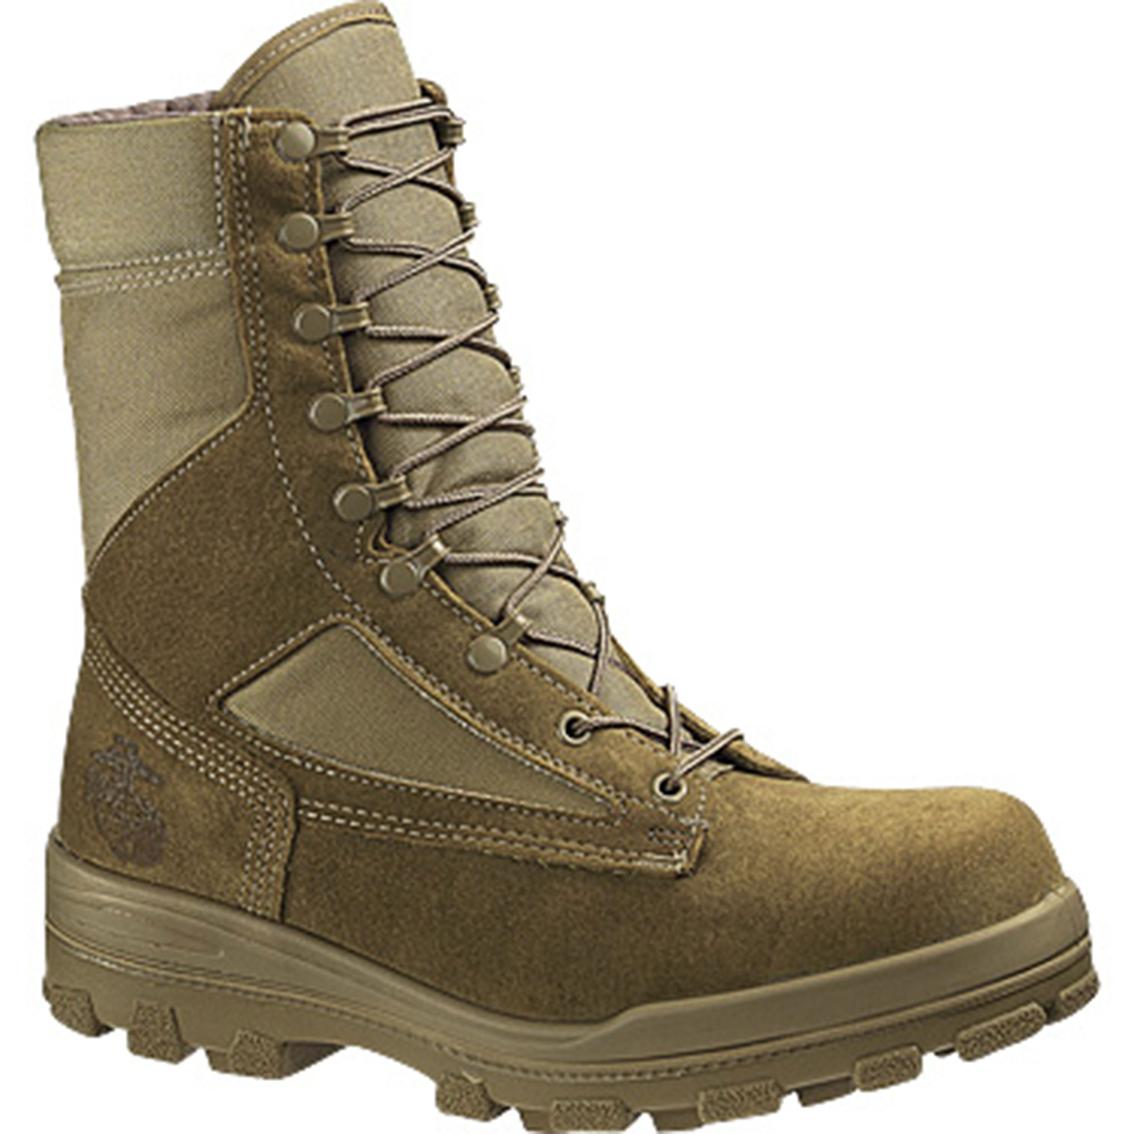 cdbad66061a Bates Usmc Durashock Steel Toe Hot Weather Boot E40501 | Low ...